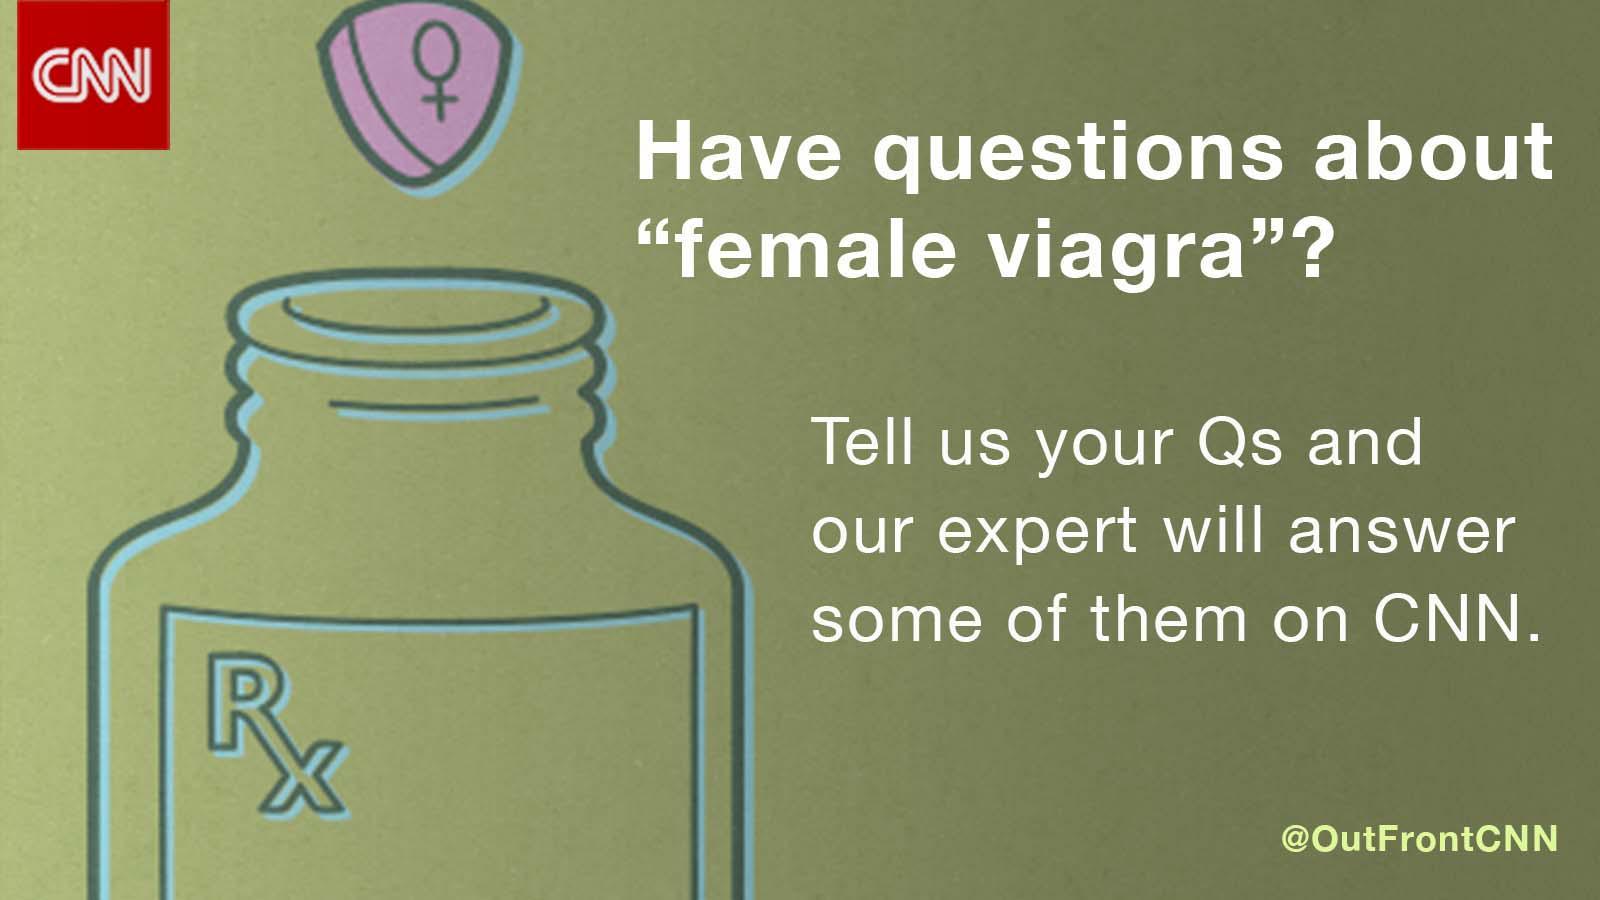 Female viagra how it works